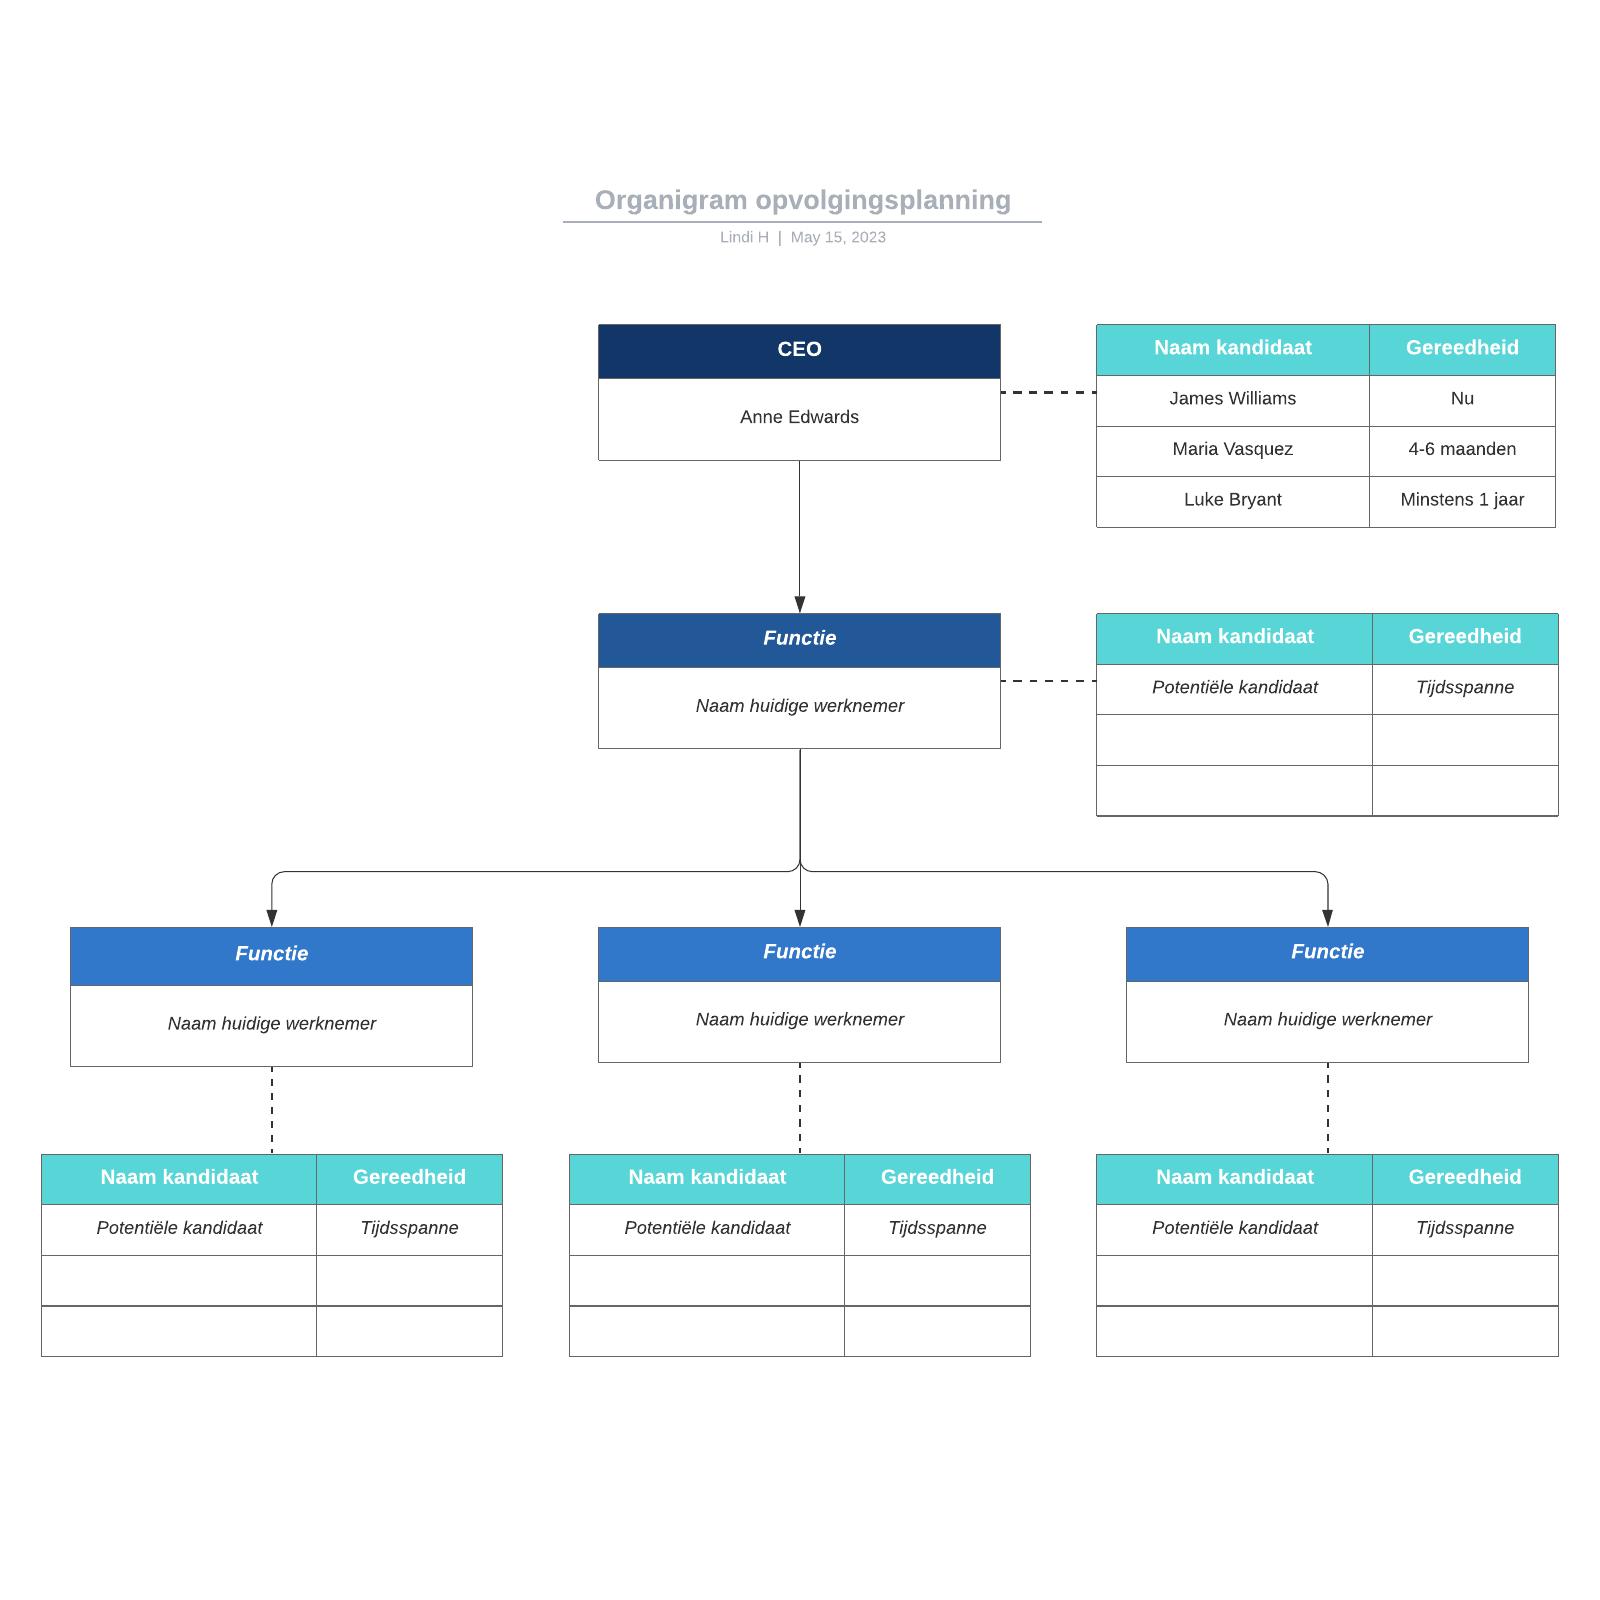 Organigram opvolgingsplanning